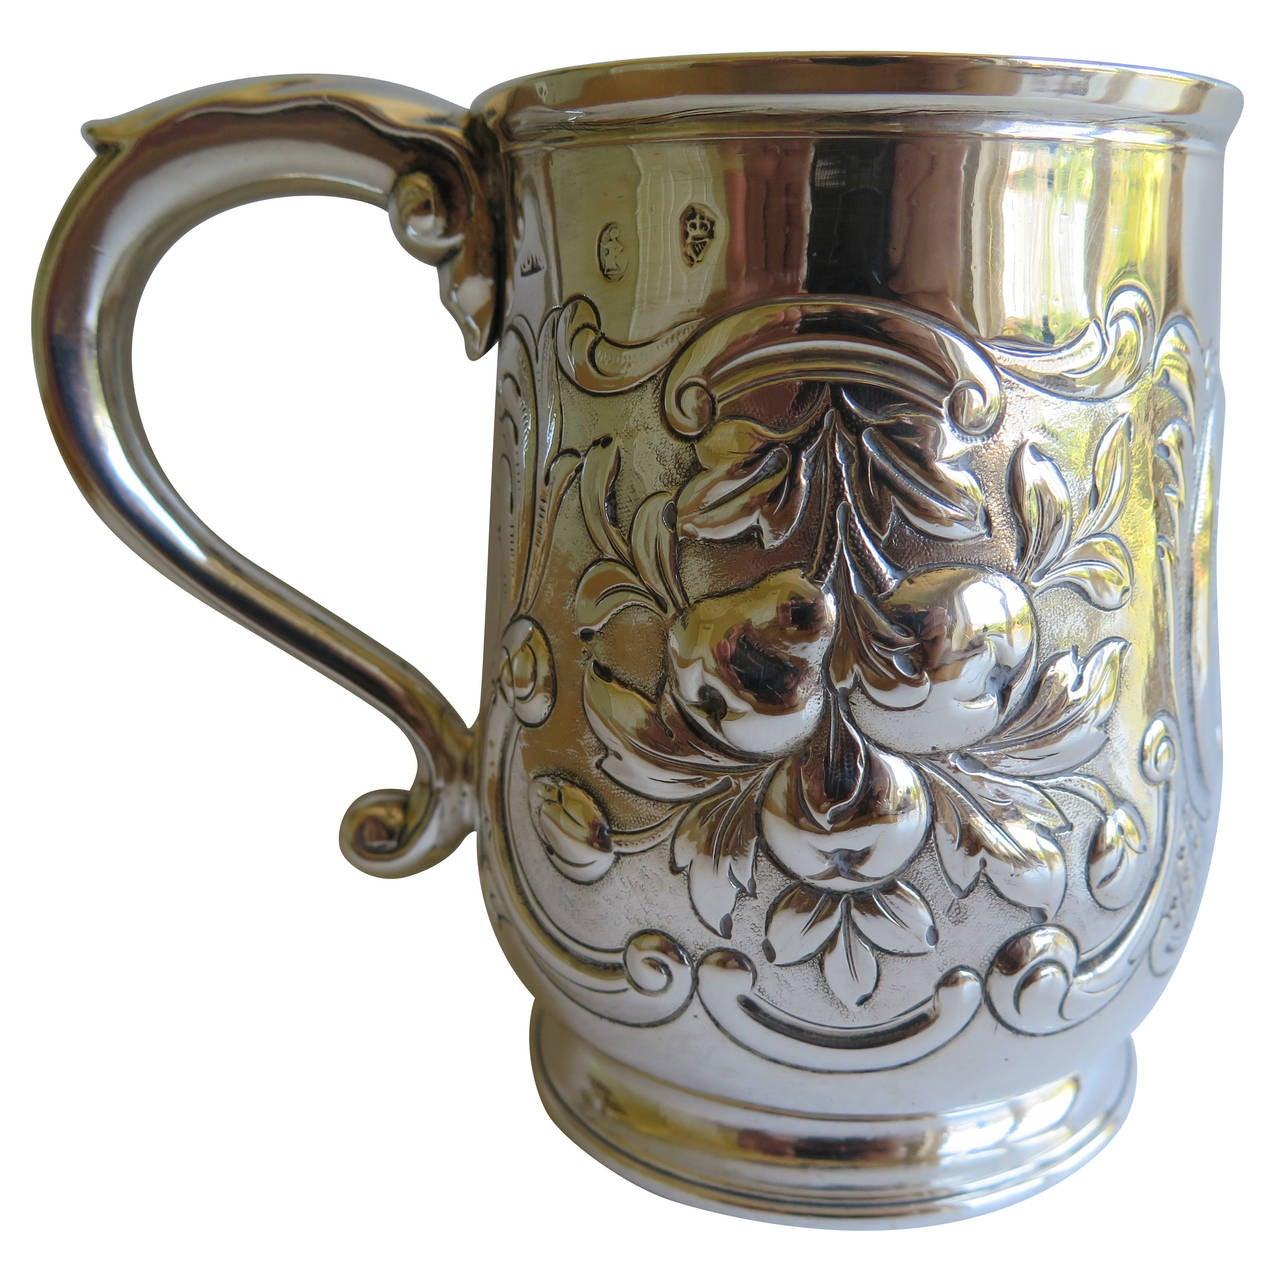 Rare Irish George II Silver Mug or Tankard by John Moore, Dublin 1740 1